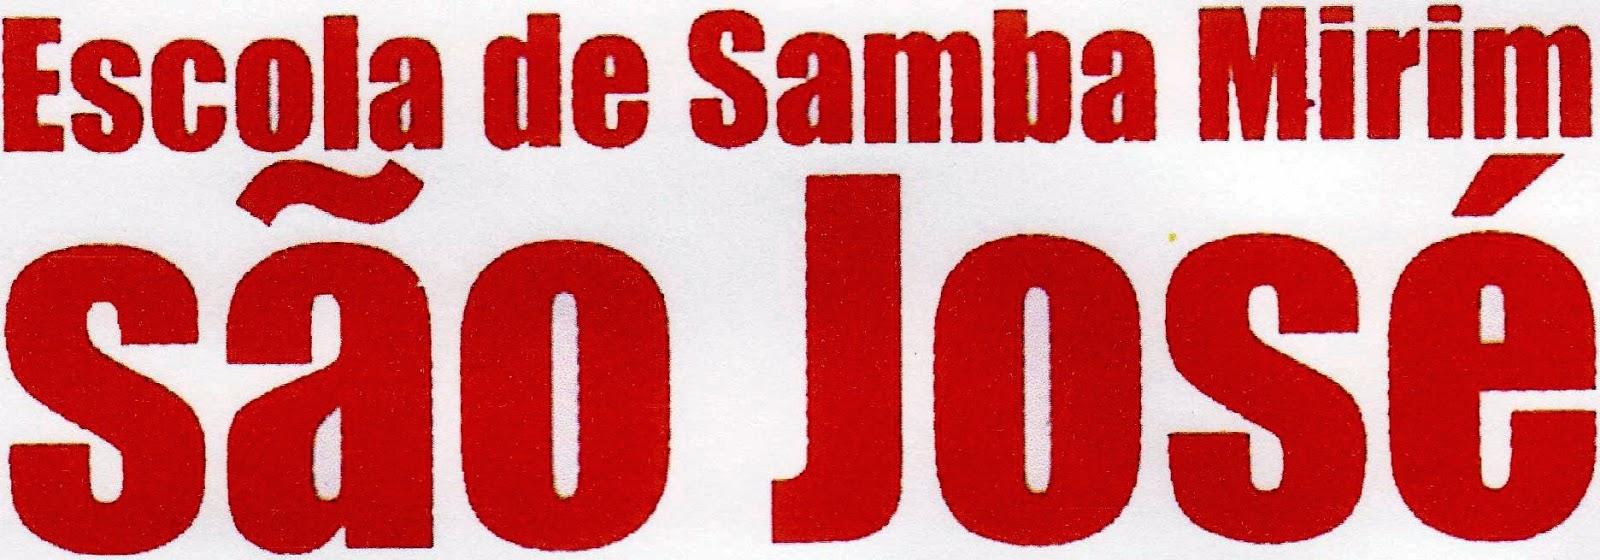 http://2.bp.blogspot.com/-t8N8eBA4lwE/UzgdNzAOK8I/AAAAAAAACPk/t15XQ6eMCqU/s1600/ESCOLA+DE+SAMBA+MIRIM+UNIDOS+DA+S%C3%83O+JOS%C3%89.JPG